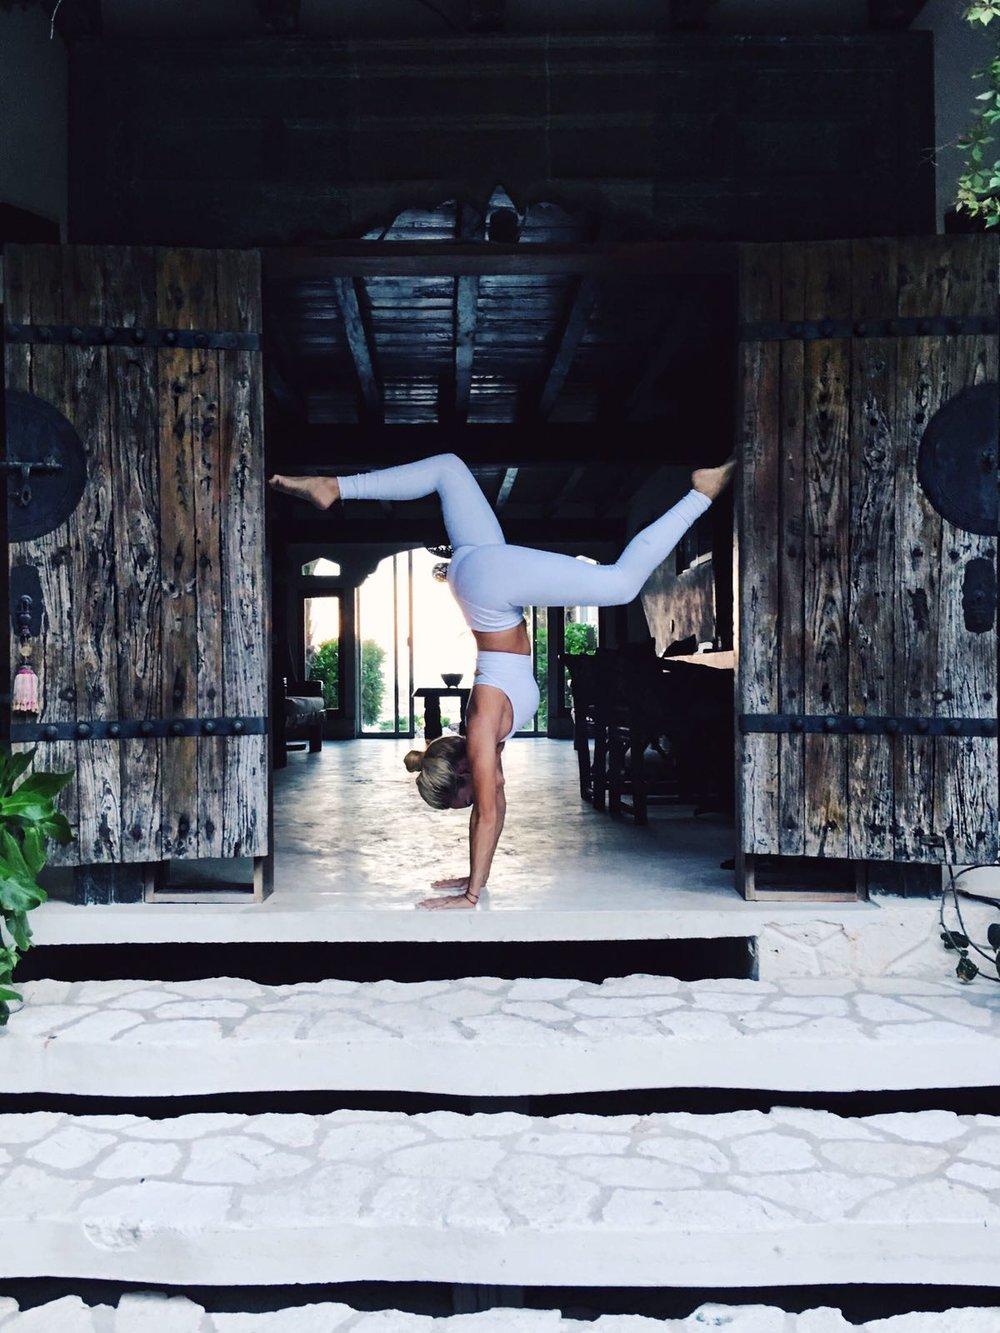 Flipped upside down in head to toe Alo Yoga